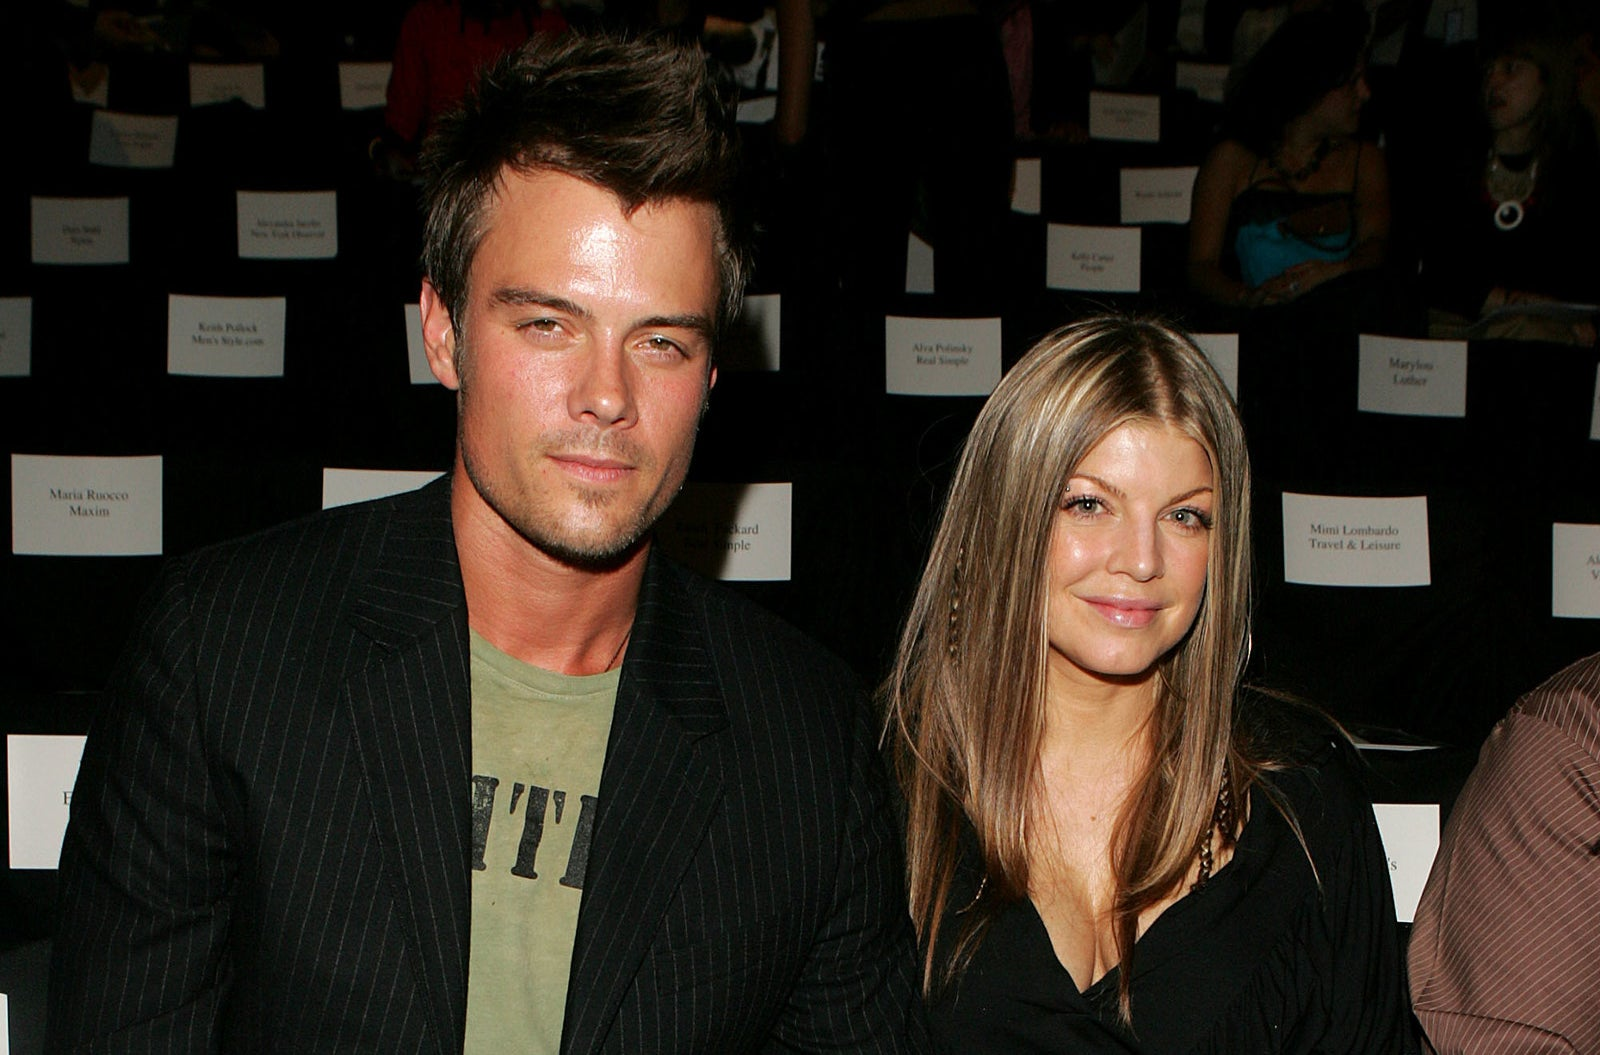 Fergie and josh duhamel pictures Josh Duhamel News, Pictures, and Videos E! News